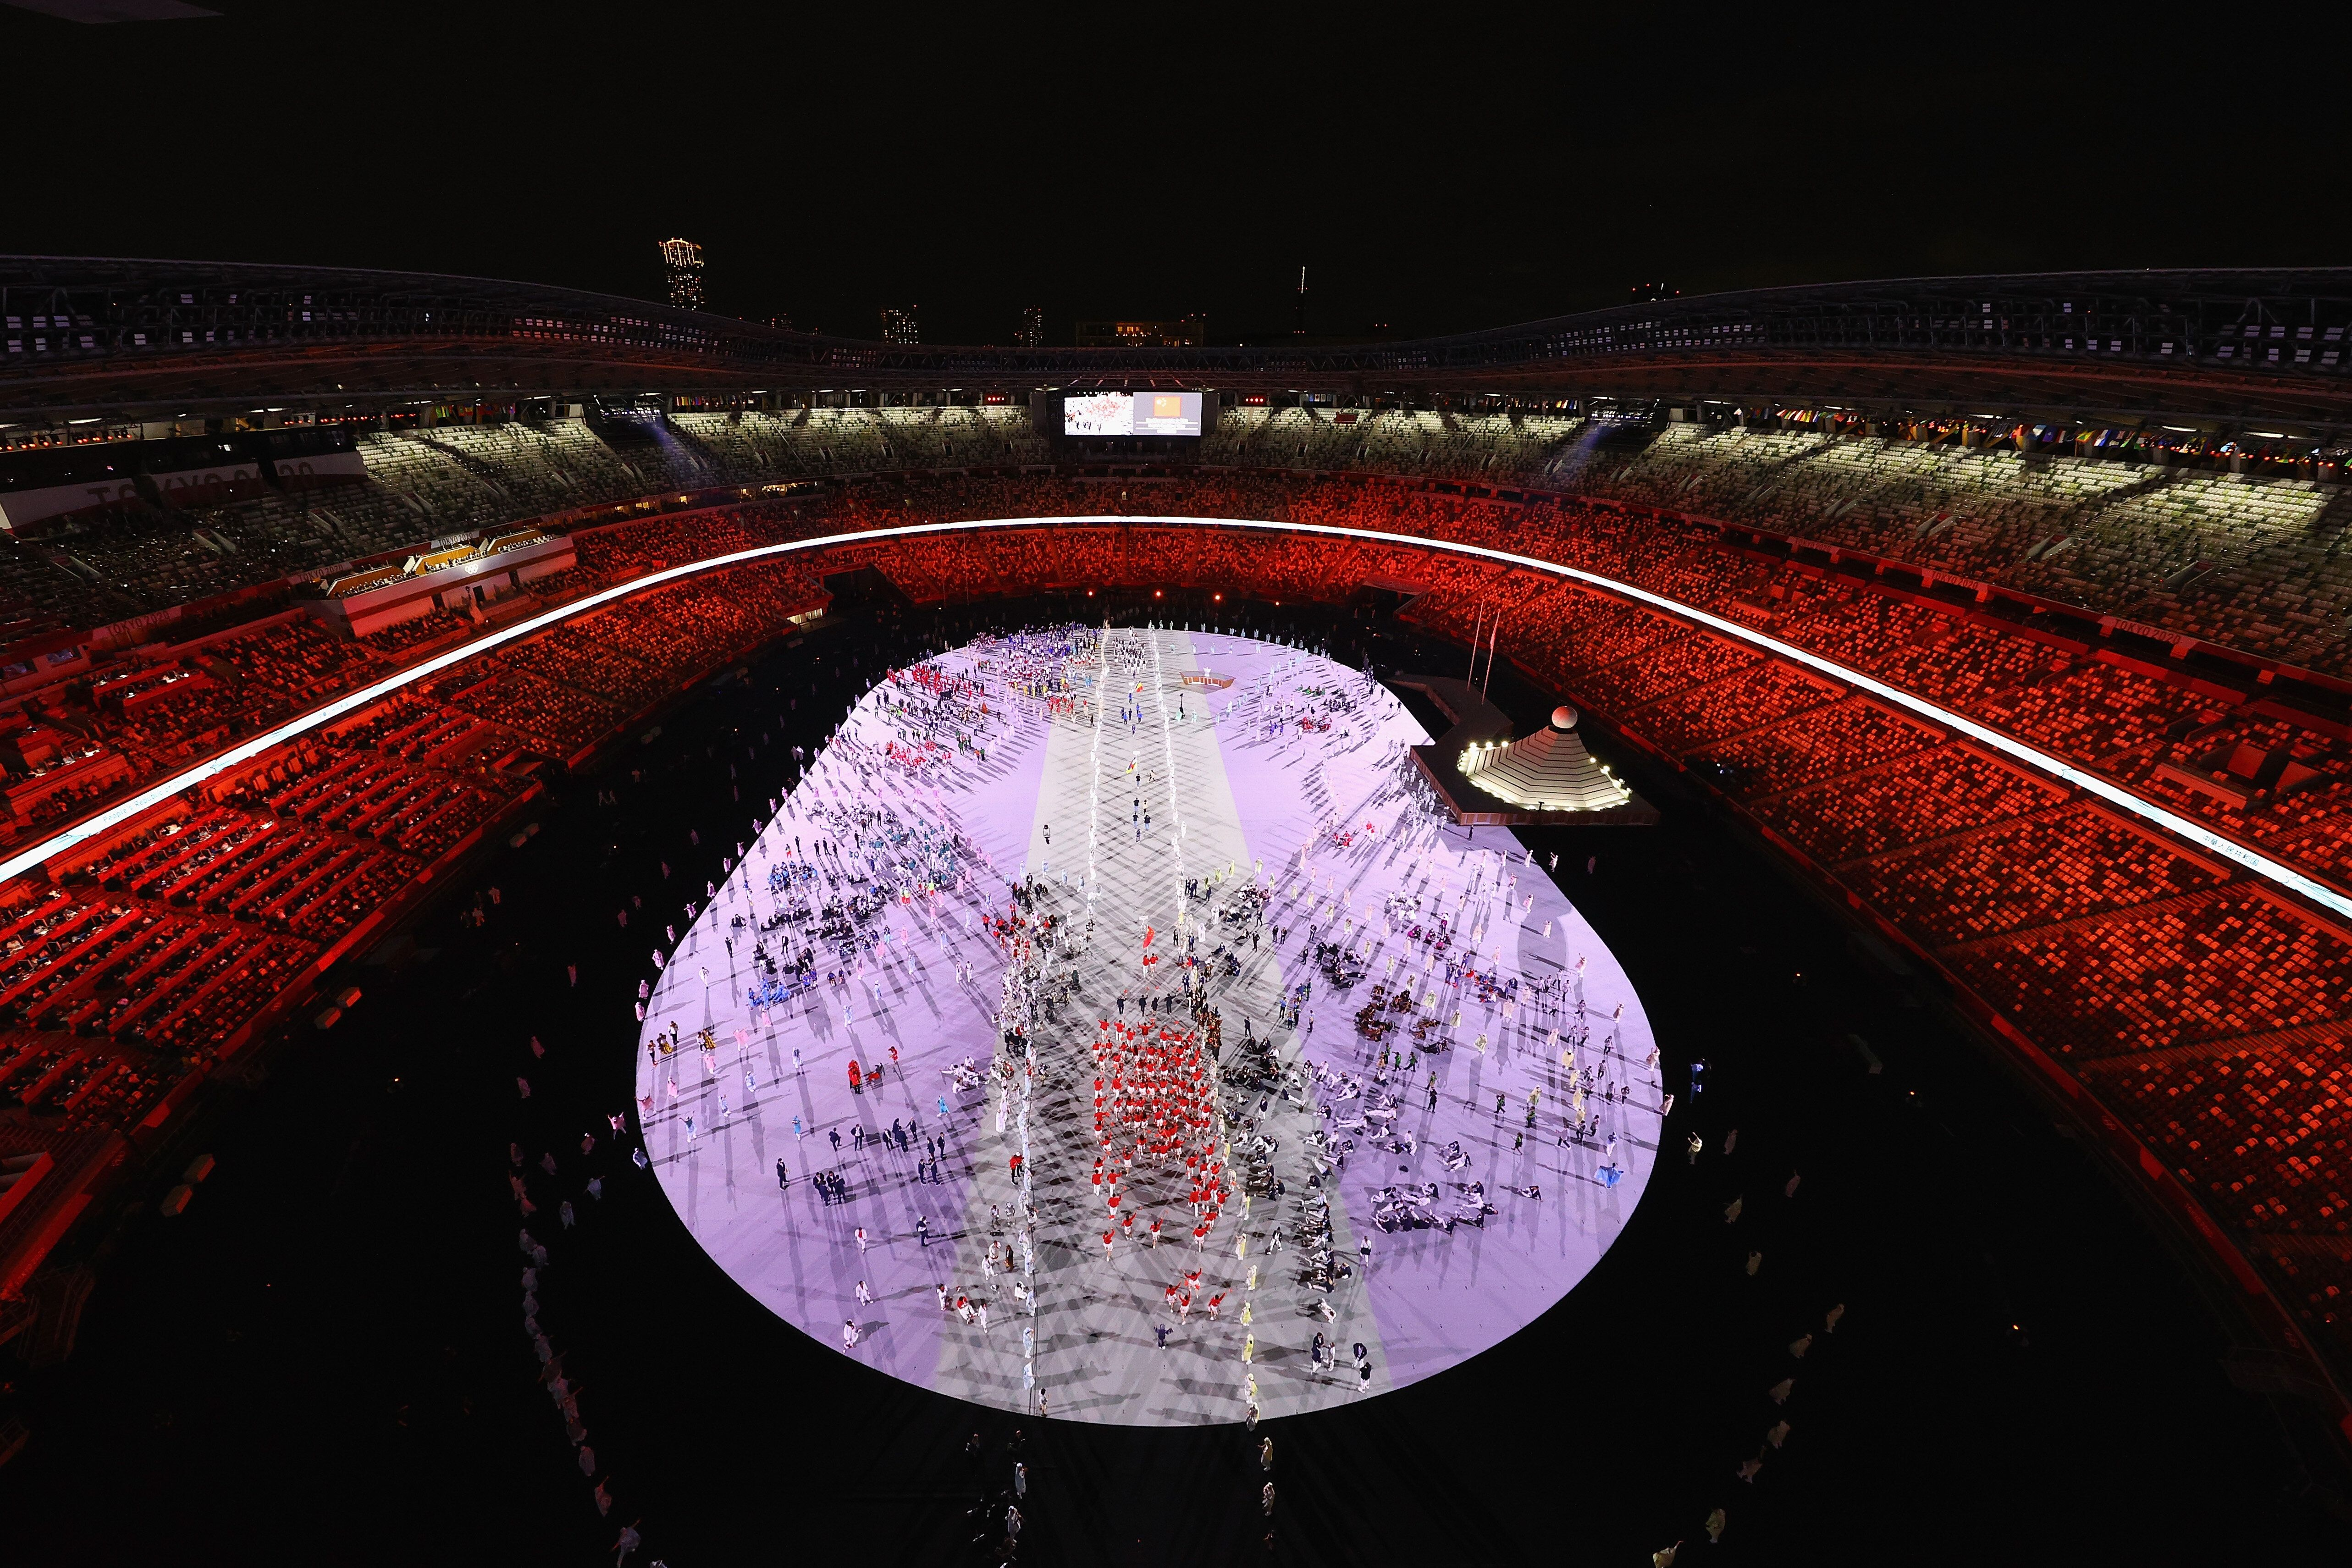 Members of Team China enter the stadium.